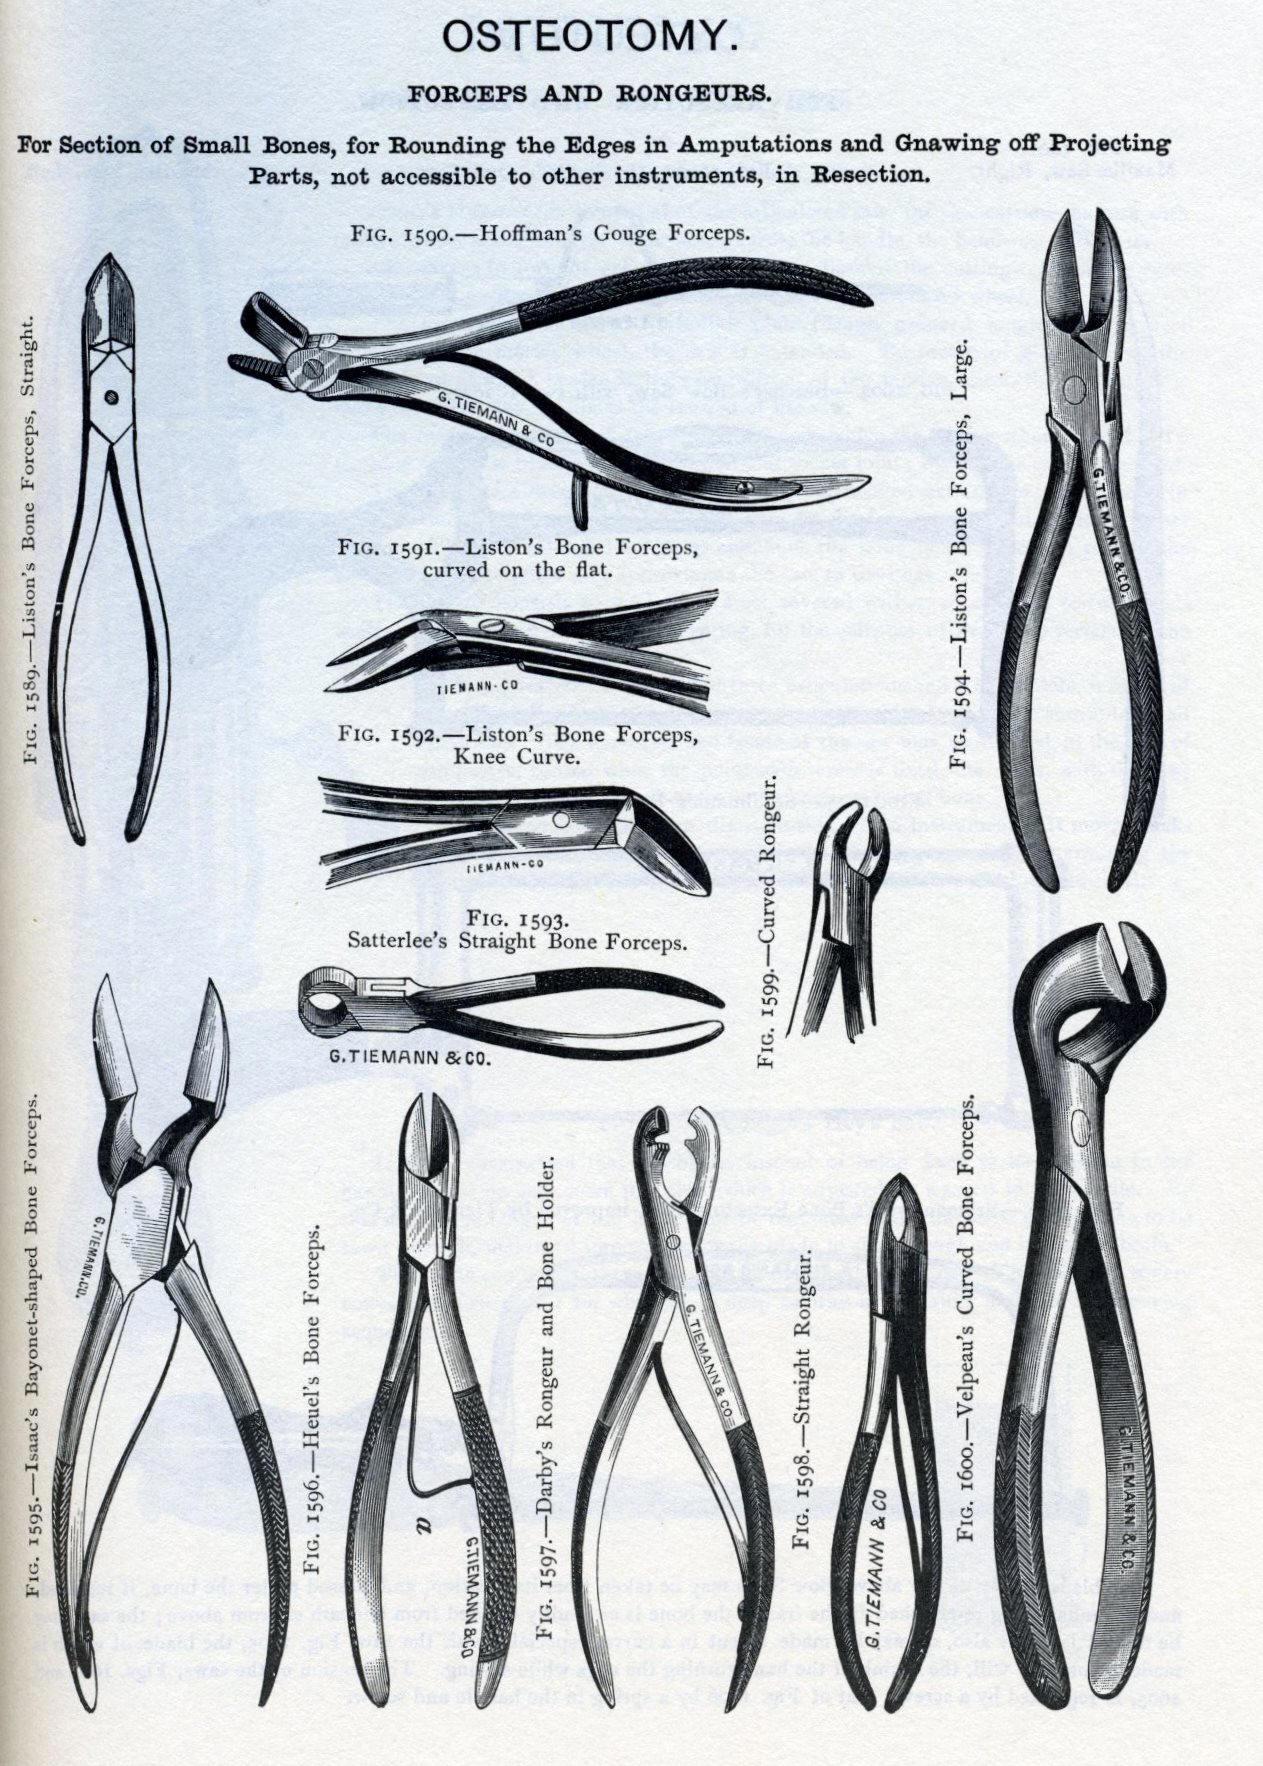 Bone Forceps Comparative Designs 1829 To 1886